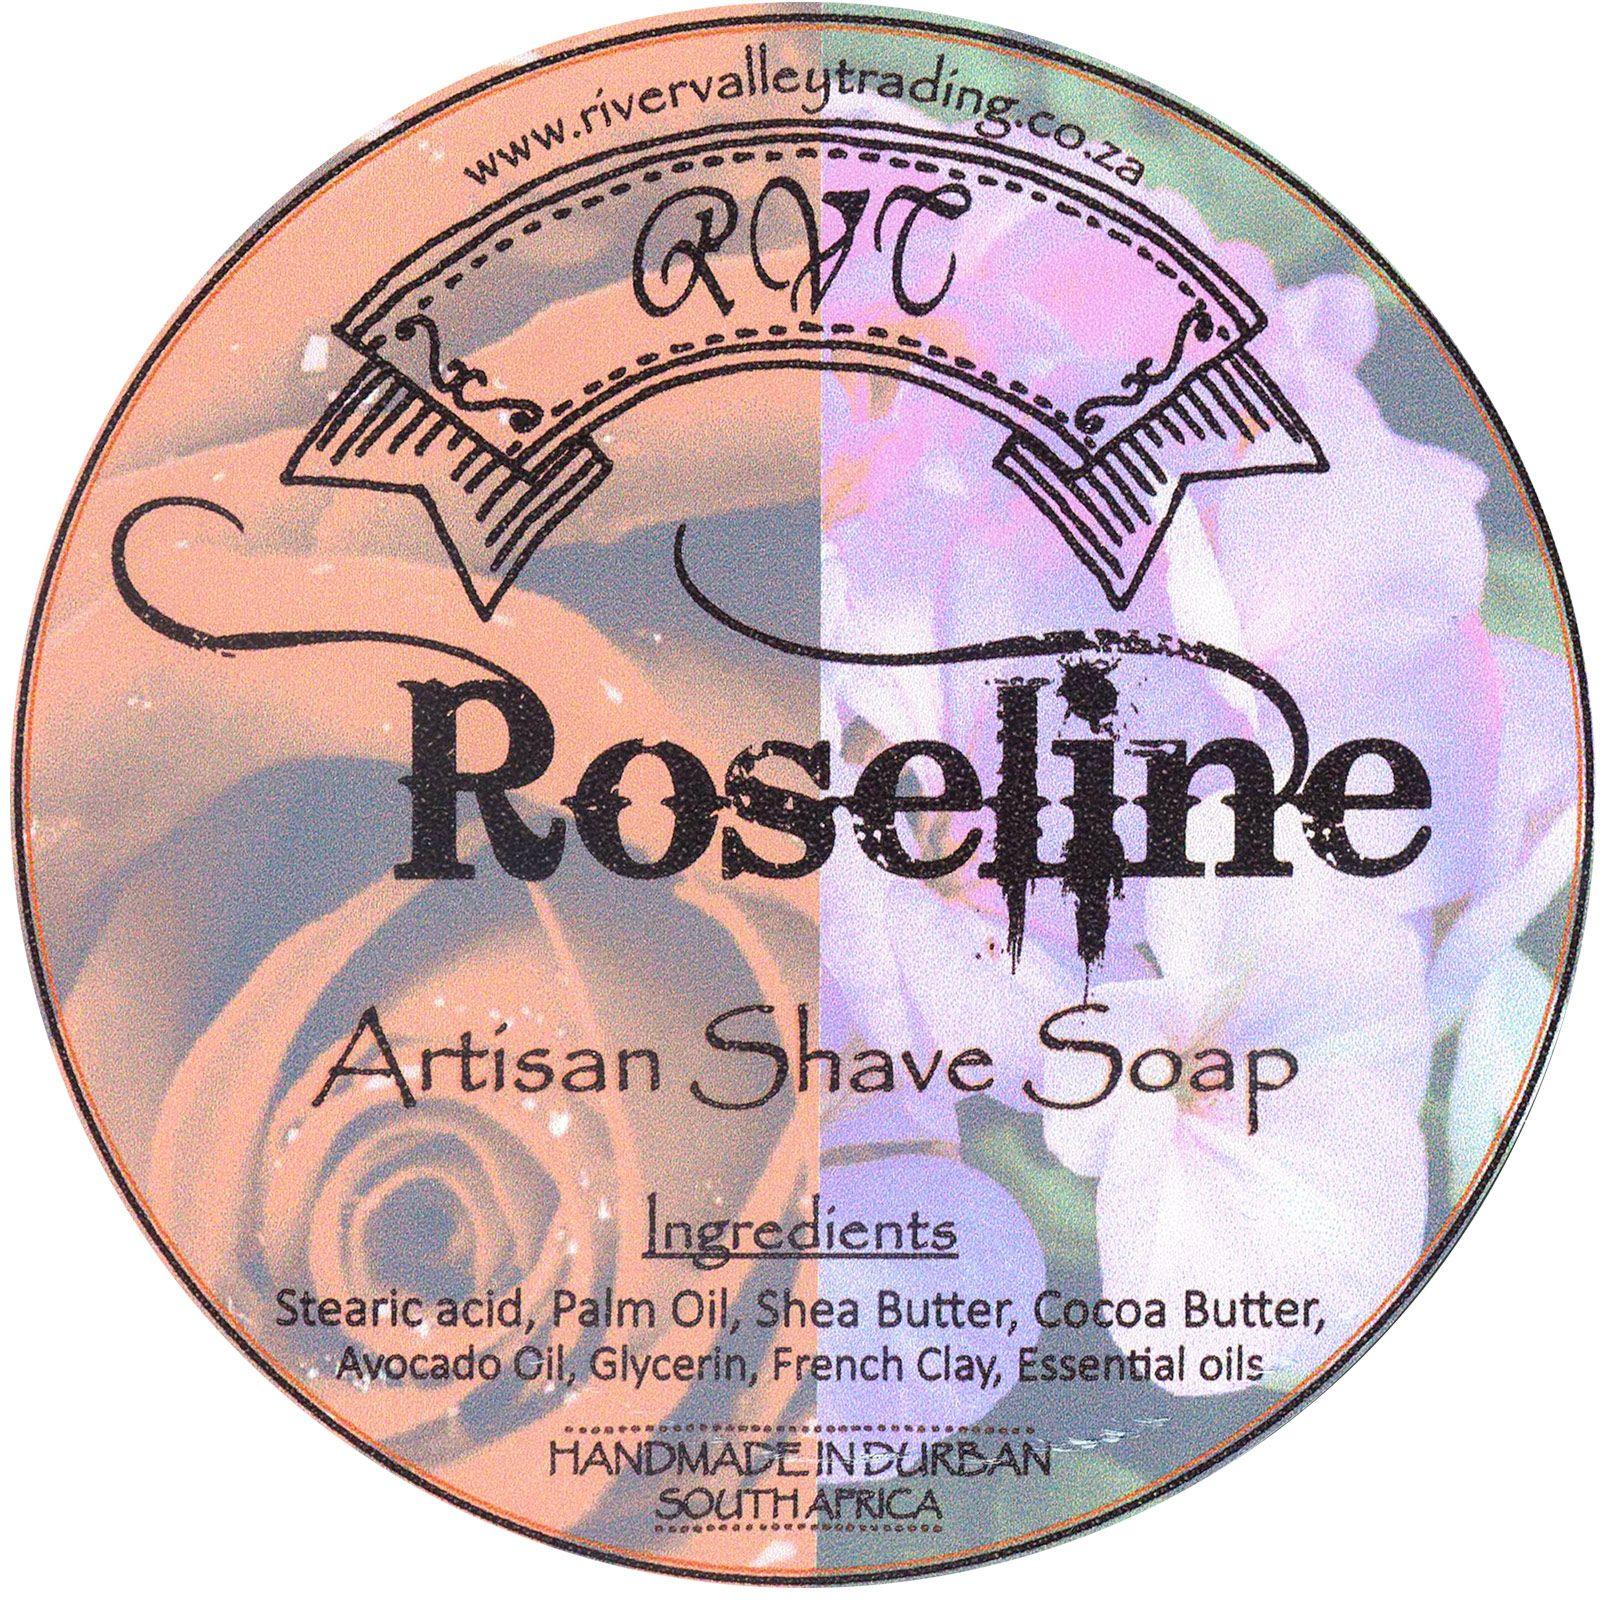 RVT Roseline Shaving Soap – etykieta ze składem